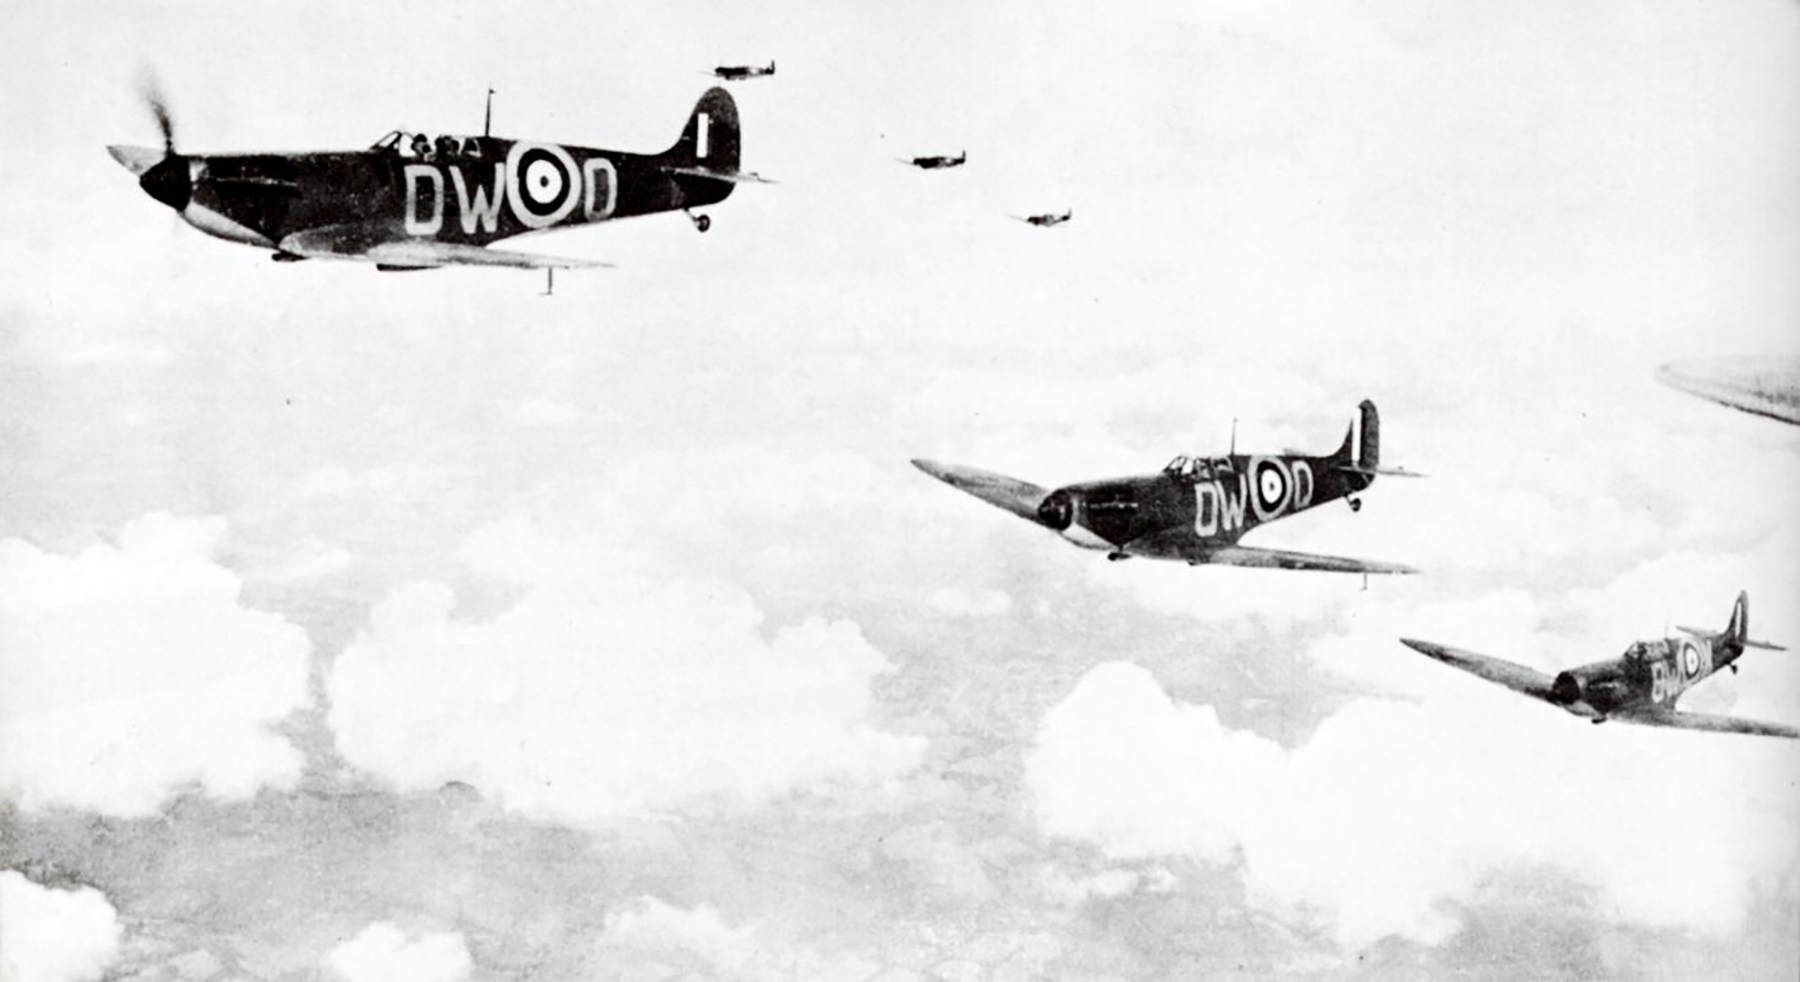 Spitfire MkIa RAF 610Sqn DWO Battle of Britain on Patrol 1940 01